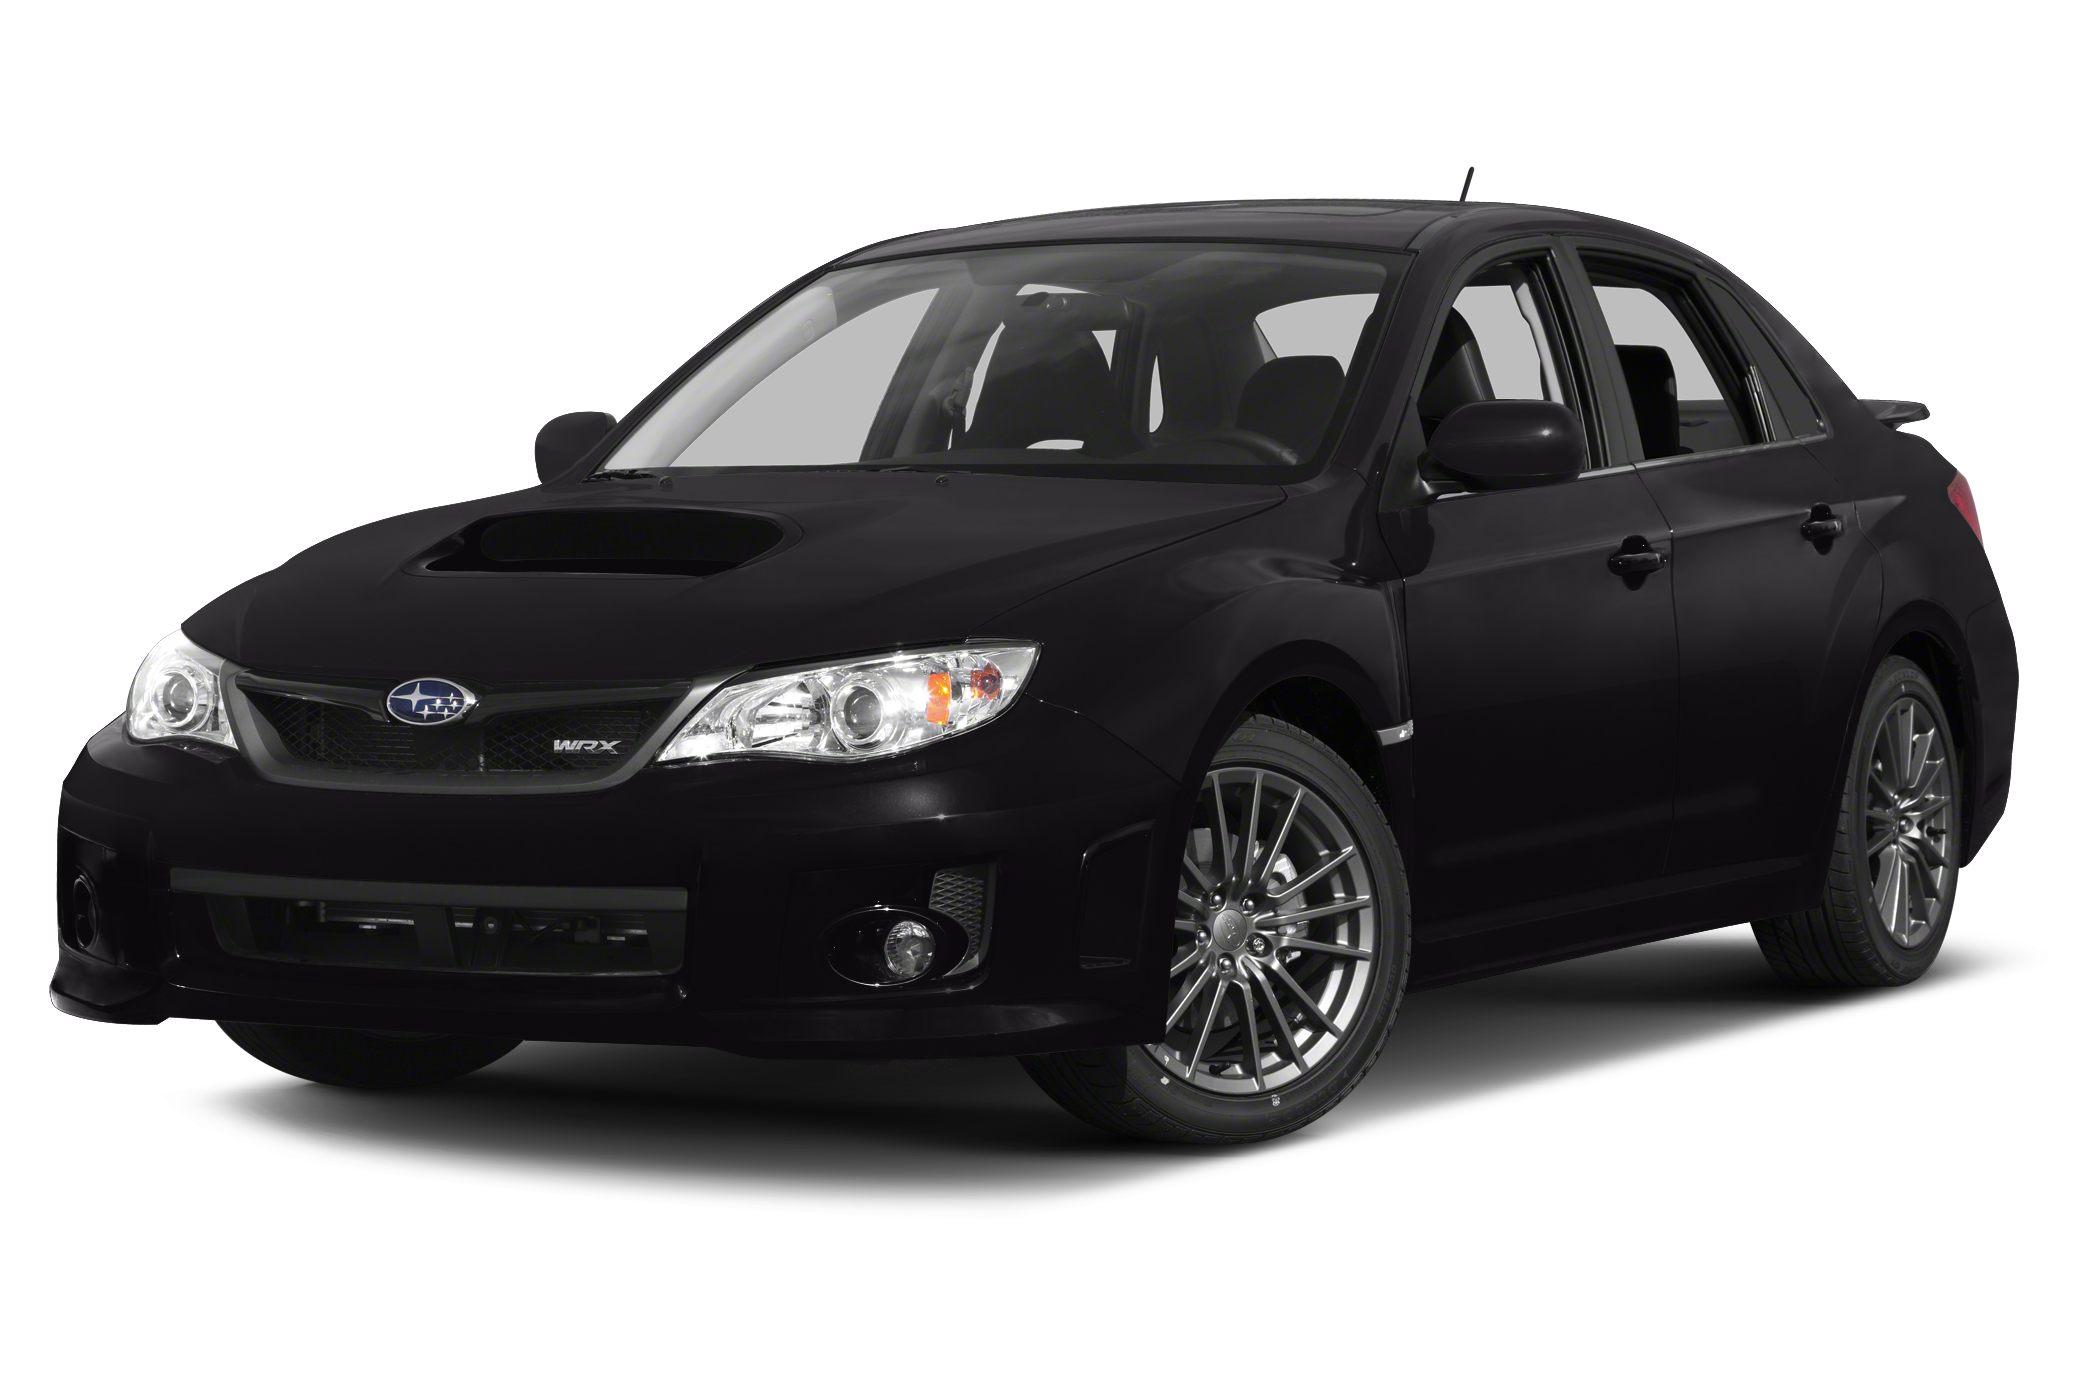 2012 Subaru Impreza WRX Sedan for sale in Rapid City for $22,990 with 43,863 miles.